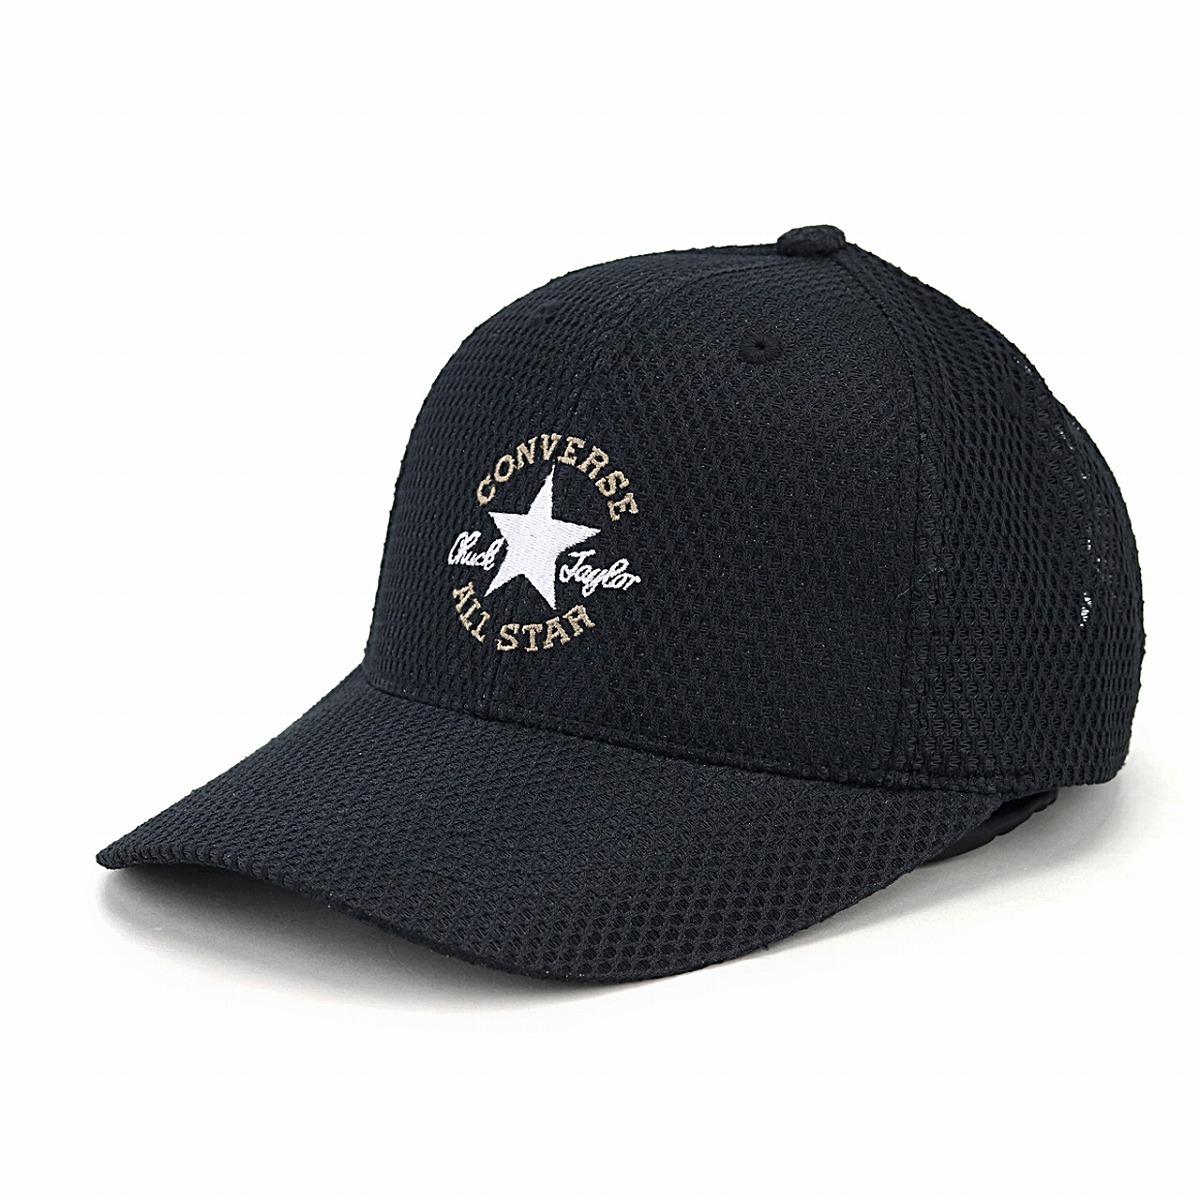 ELEHELM HAT STORE  All-stars logo cap big size CONVERSE ALL STAR ... 54f9ecc4dc8